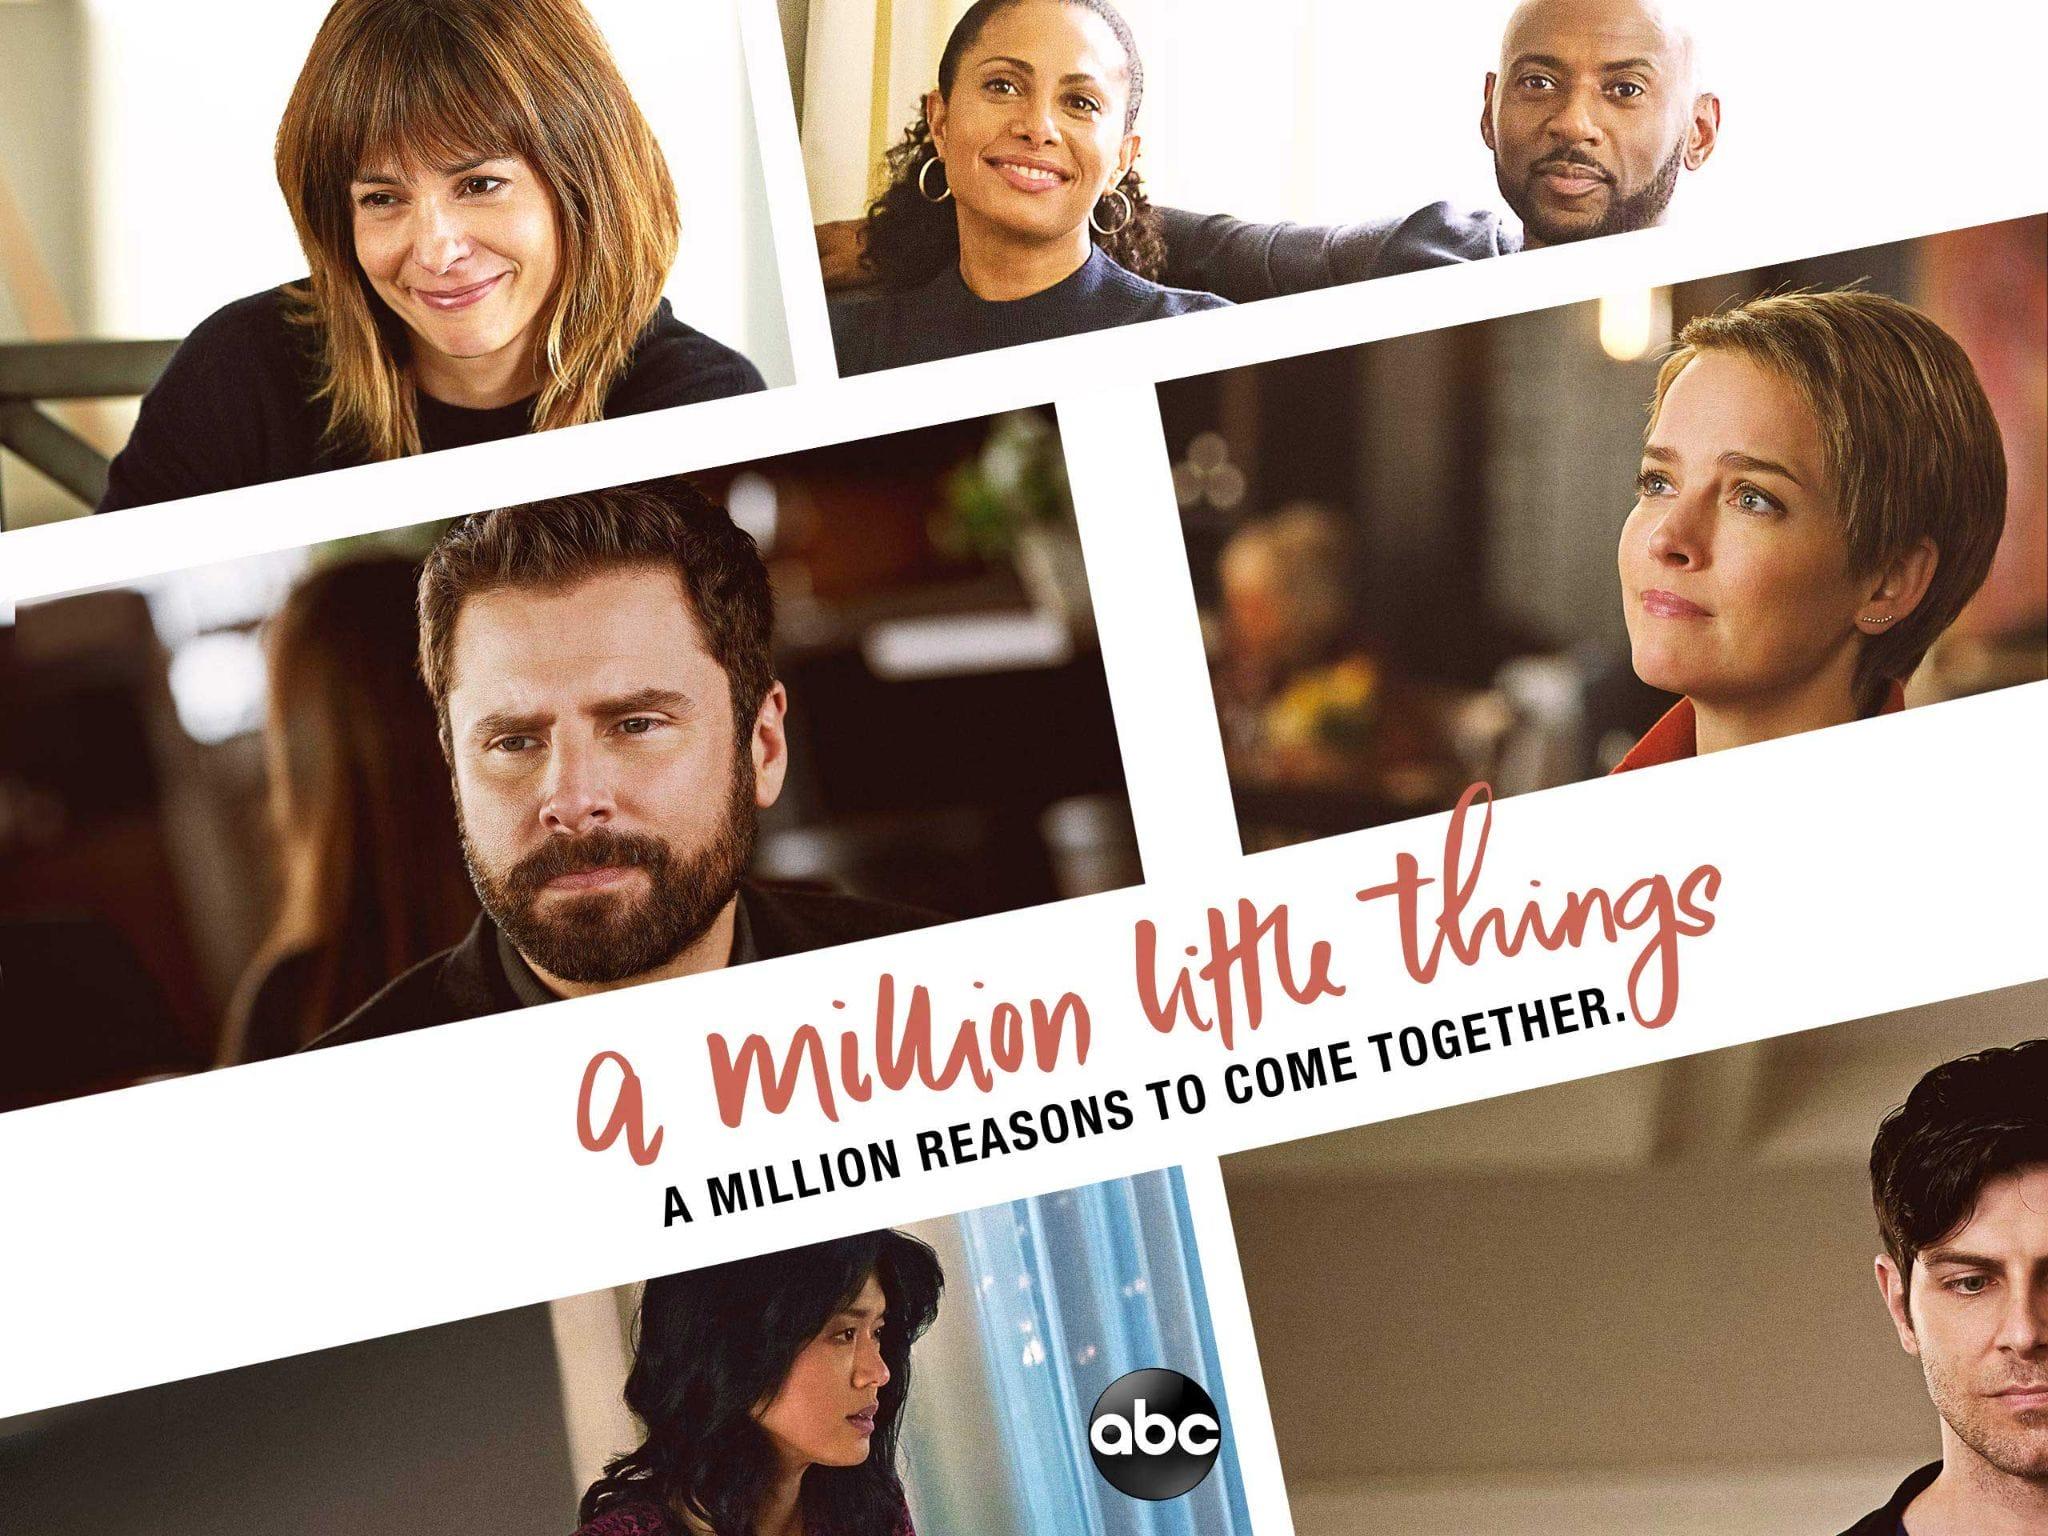 A Million Little Things Season 3 Episode 11